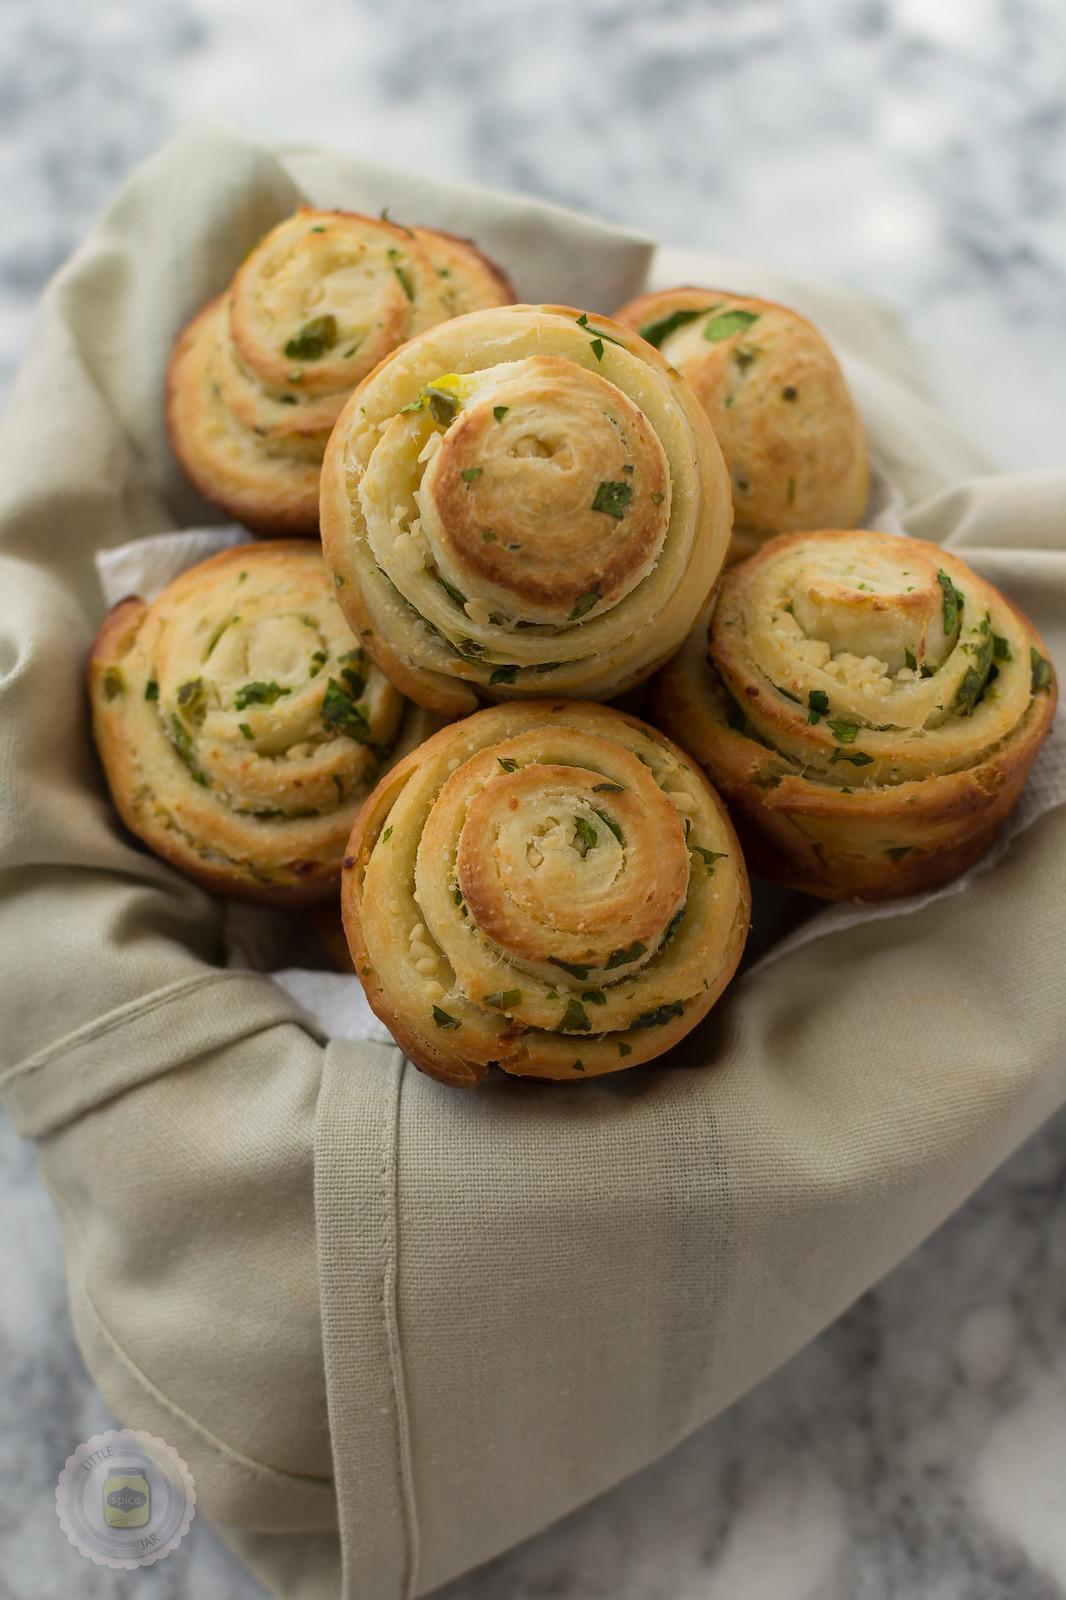 Jalapeno Parmesan Swirl Bread Dough Baked 2